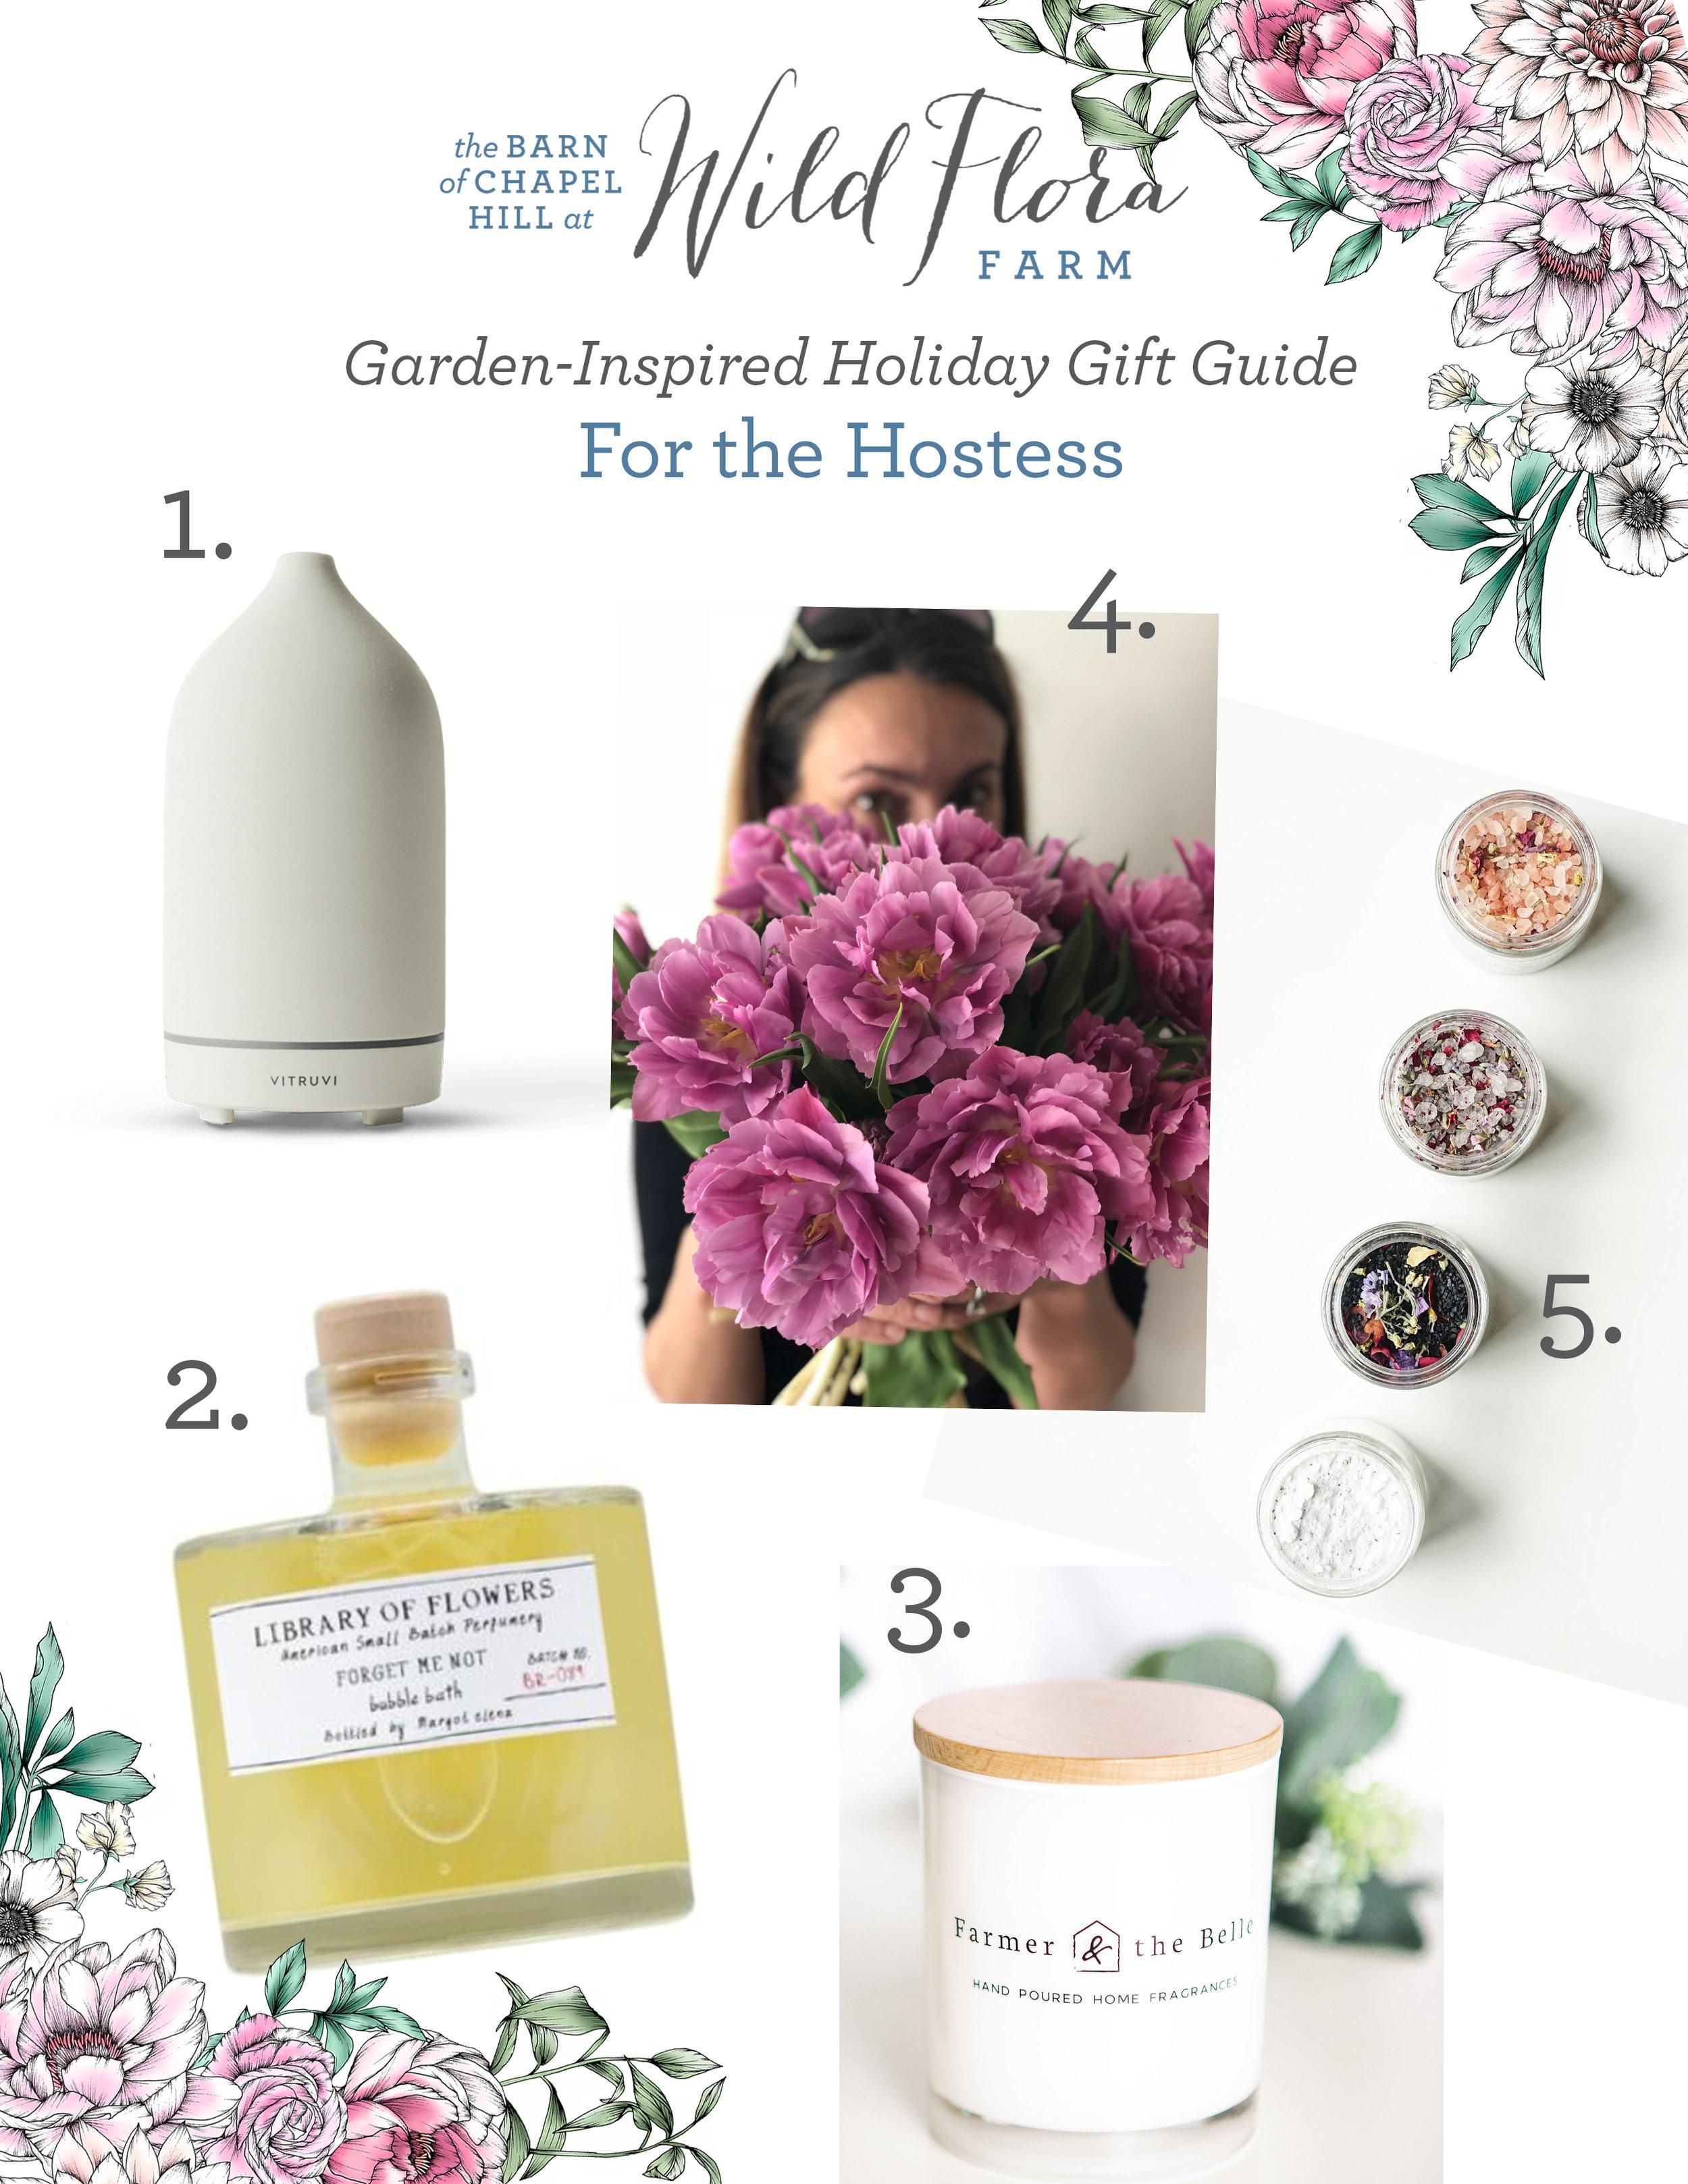 wild-flora-farm-garden-inspired-holiday-gift-guide.jpg